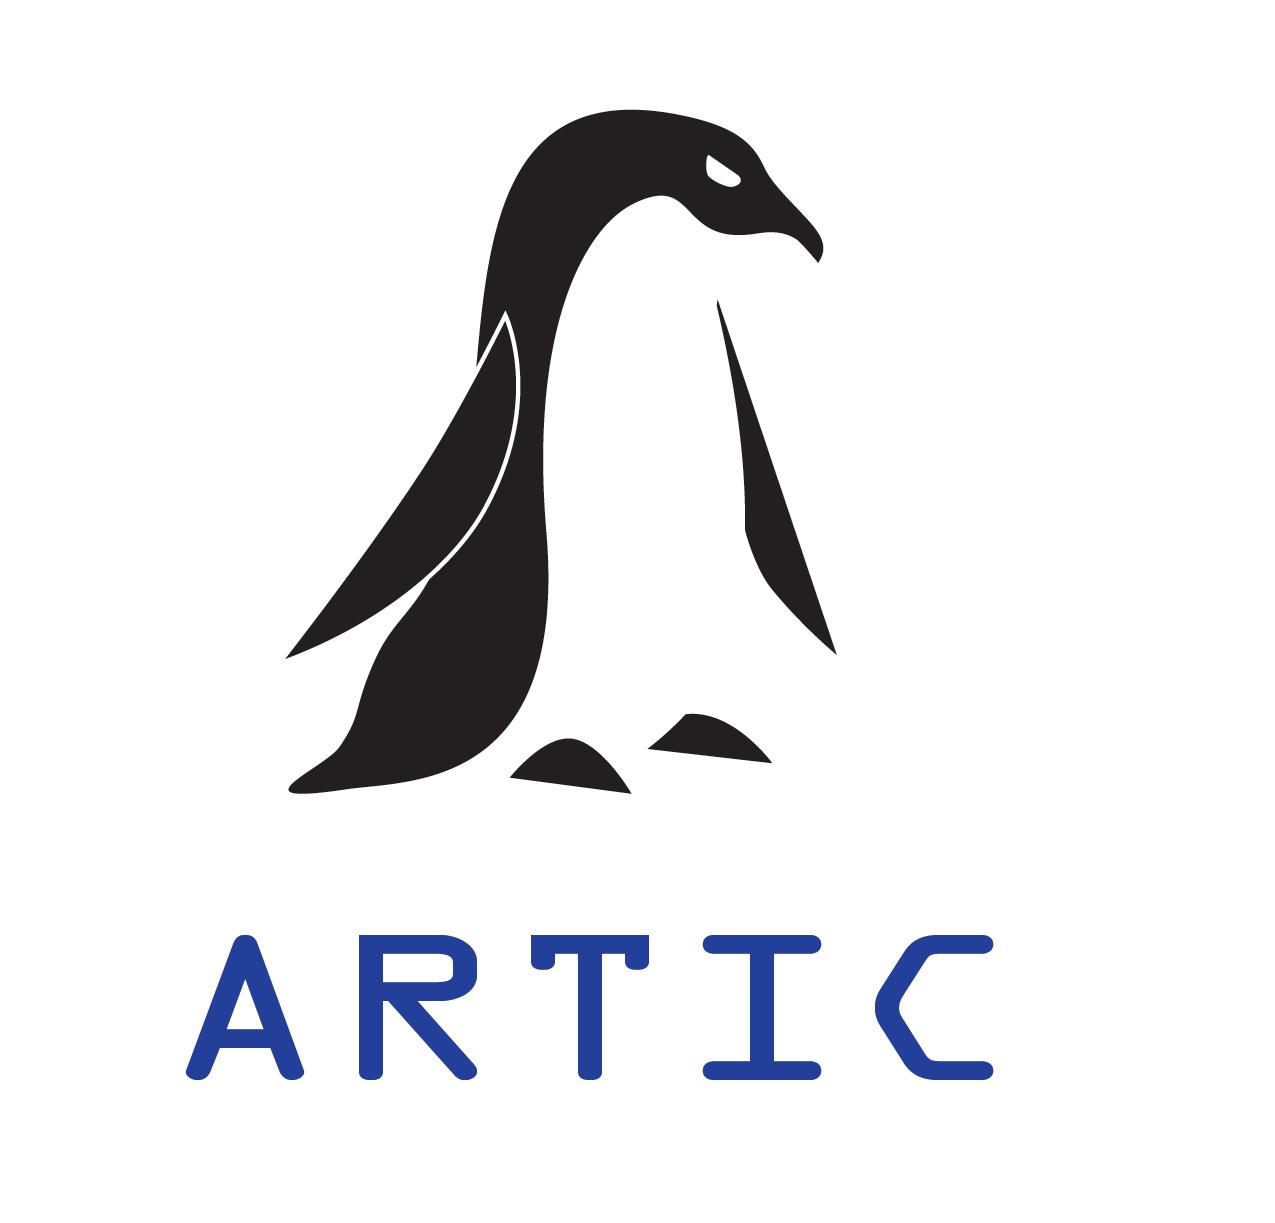 Artic3